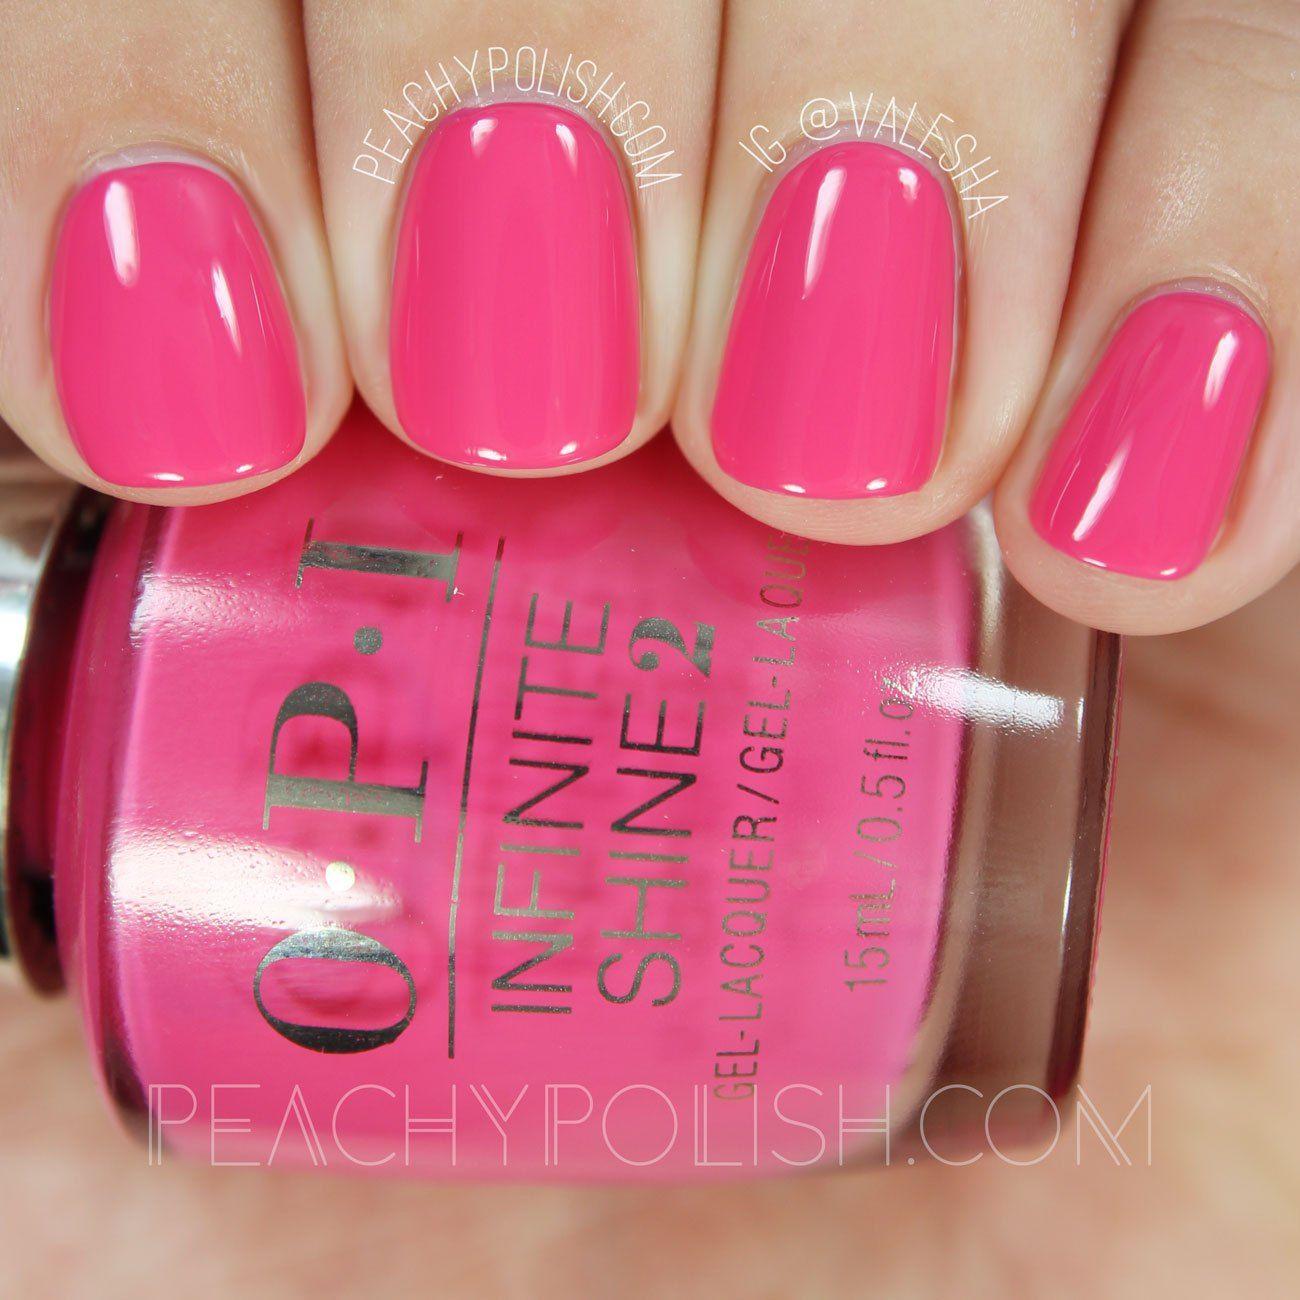 Nails Quenalbertini Opi Strawberry Margarita Infinite Shine Iconic Collection Peachy Polish Opi Nail Polish Colors Opi Nail Colors Gel Nail Colors